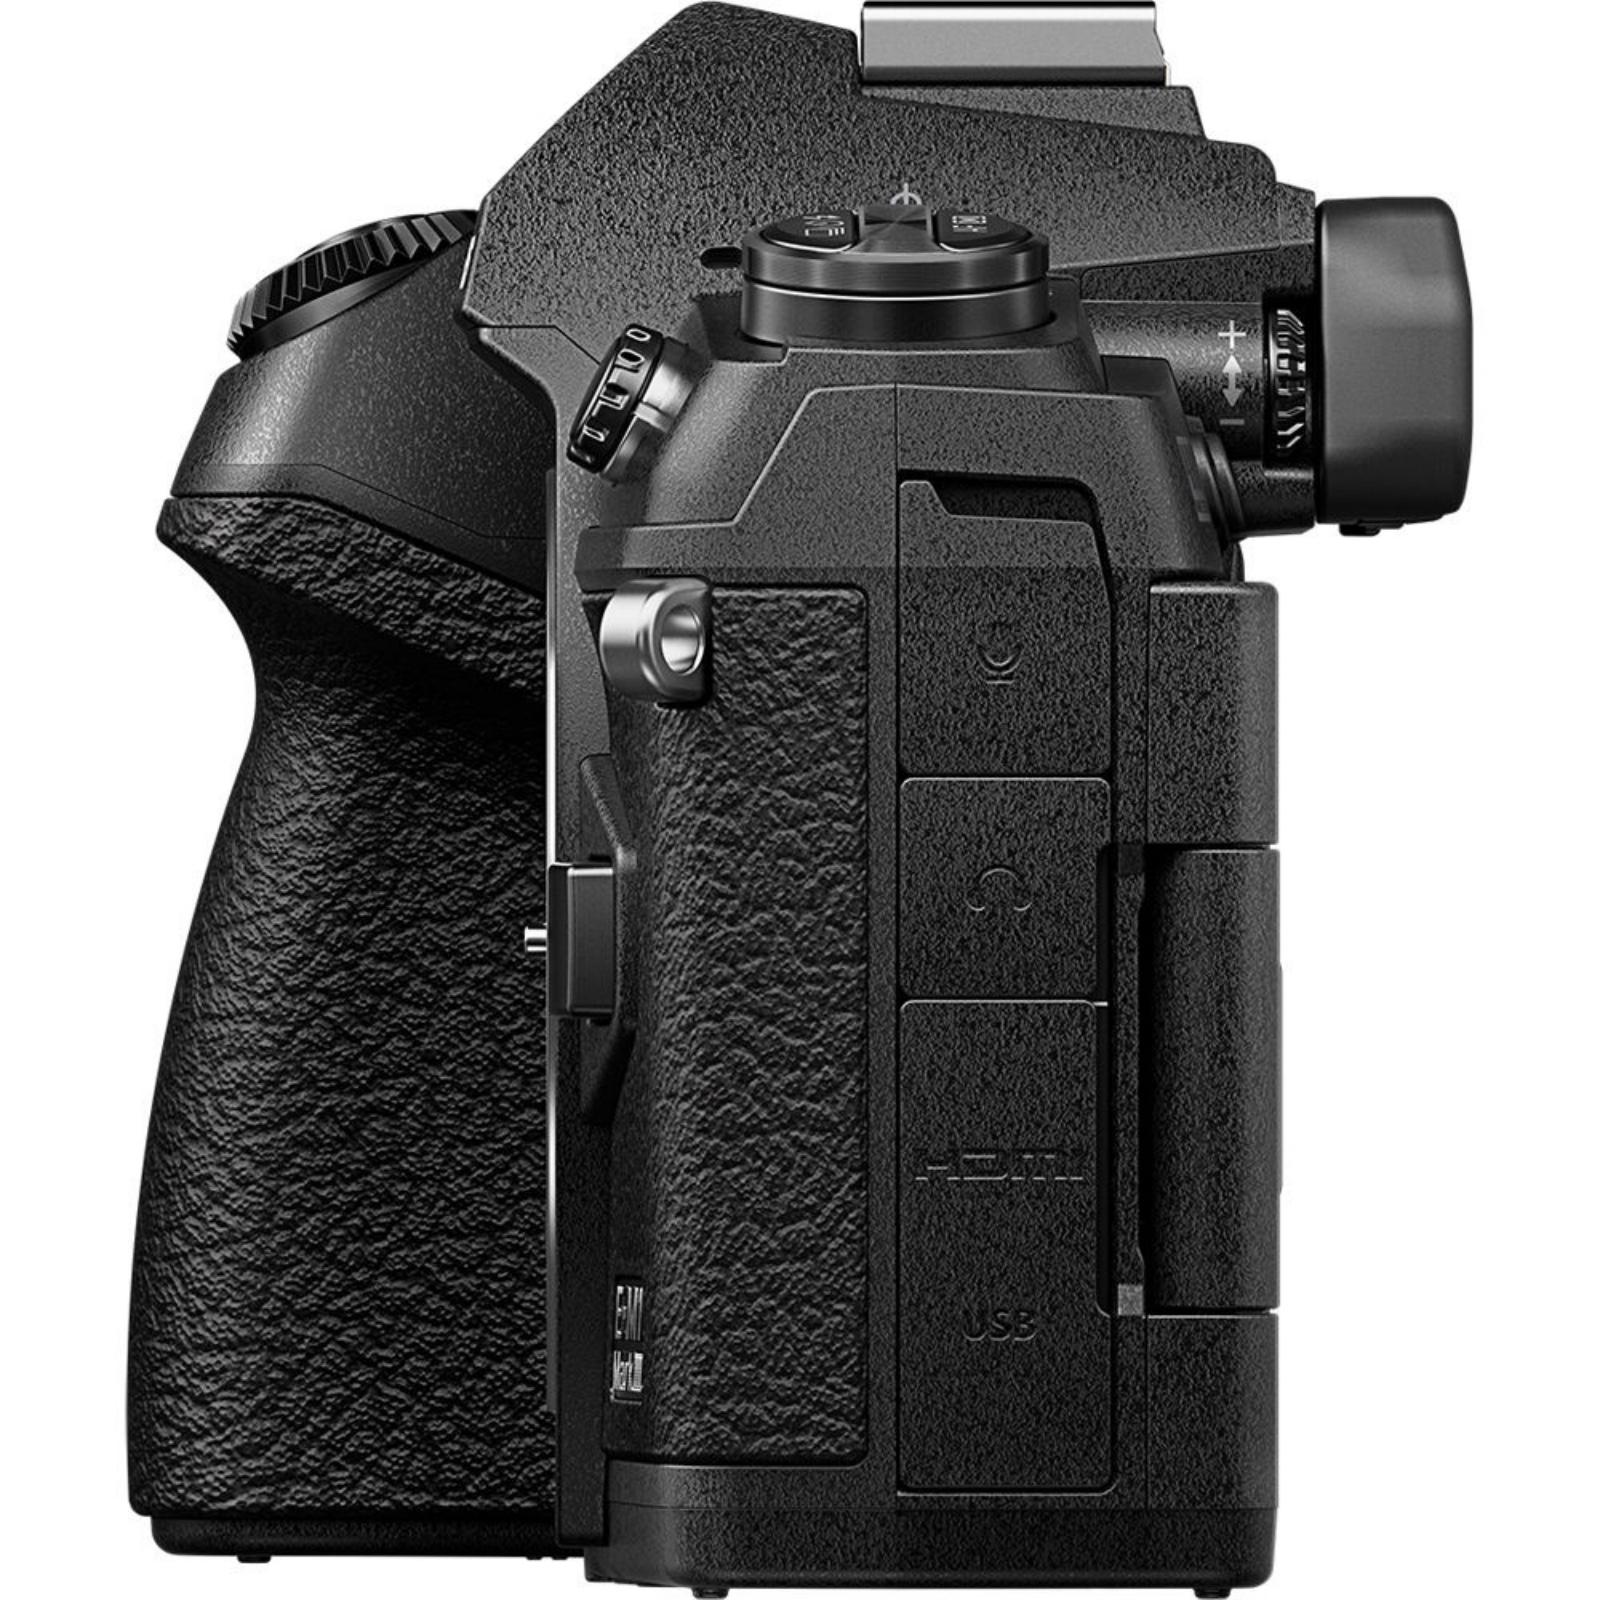 OLYMPUS オリンパス ミラーレス一眼カメラ OM-D E-M1 MarkIII ボディー ブラック 新品